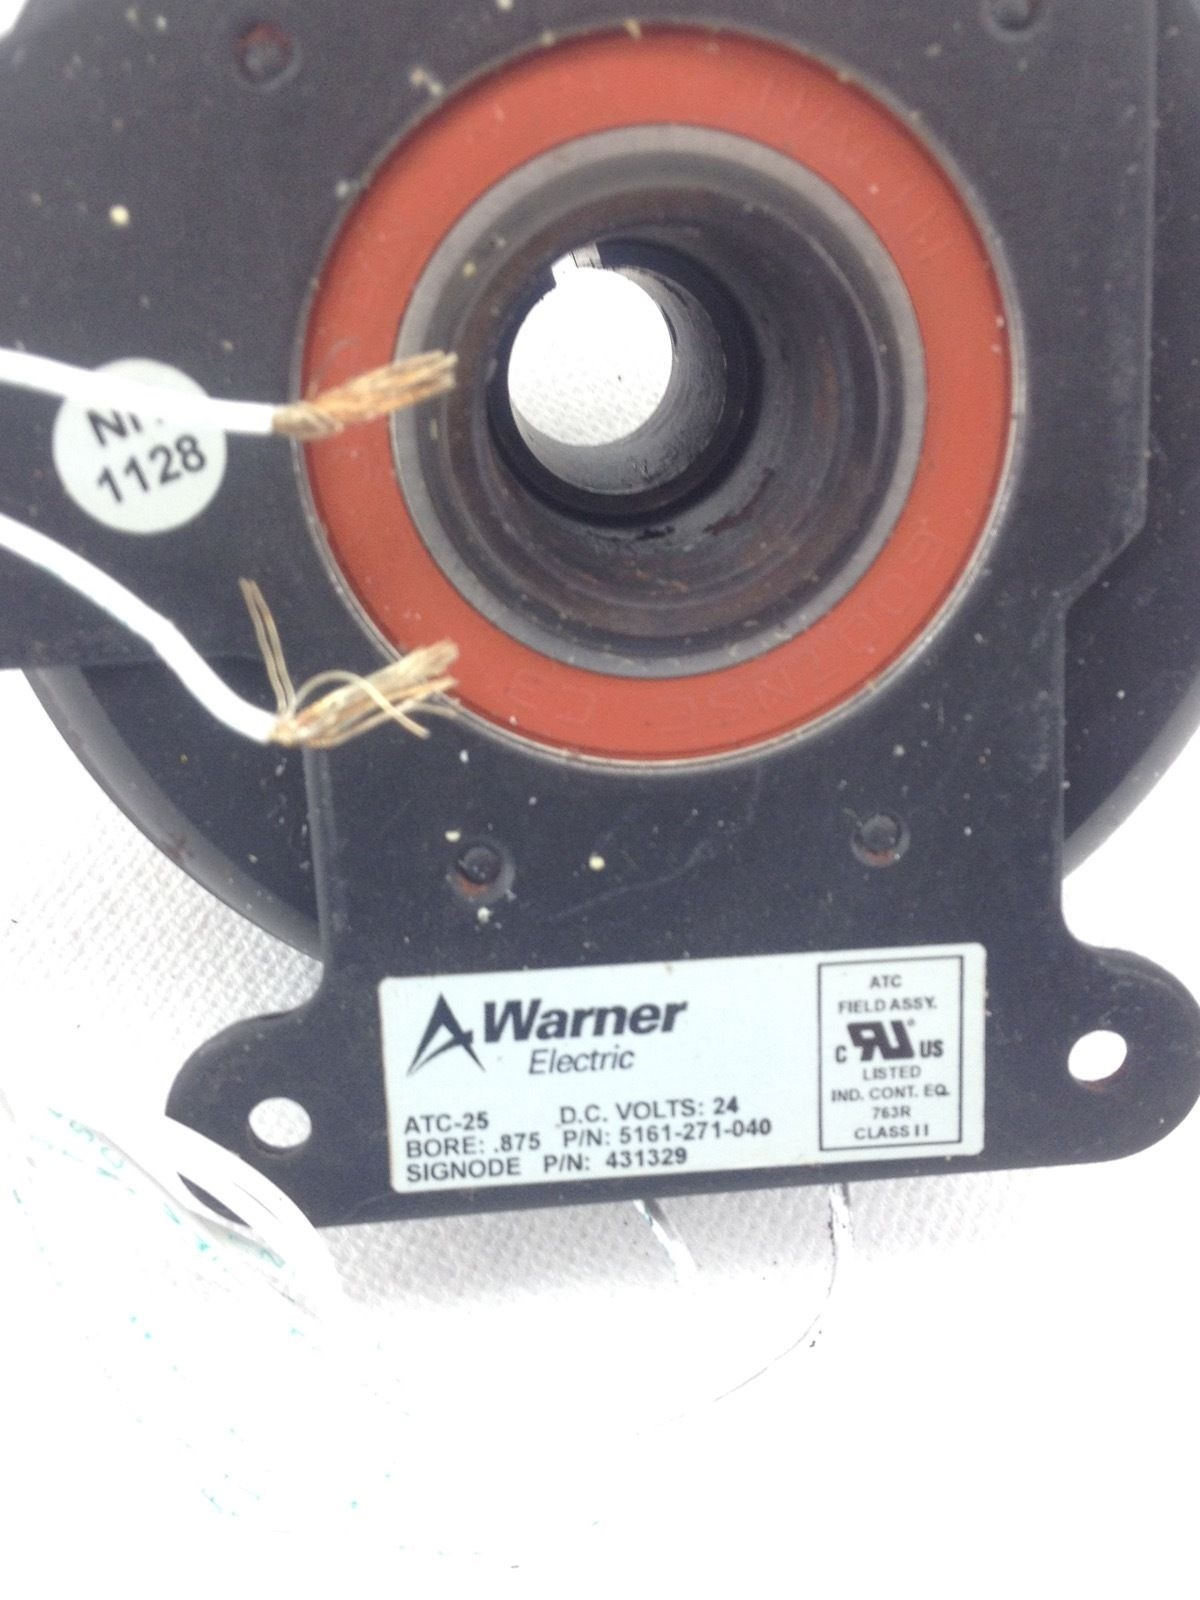 NEW! WARNER ATC-25 ELECTRIC CLUTCH 5161-271-040 24VDC SIGNODE 431329 (B191) 2